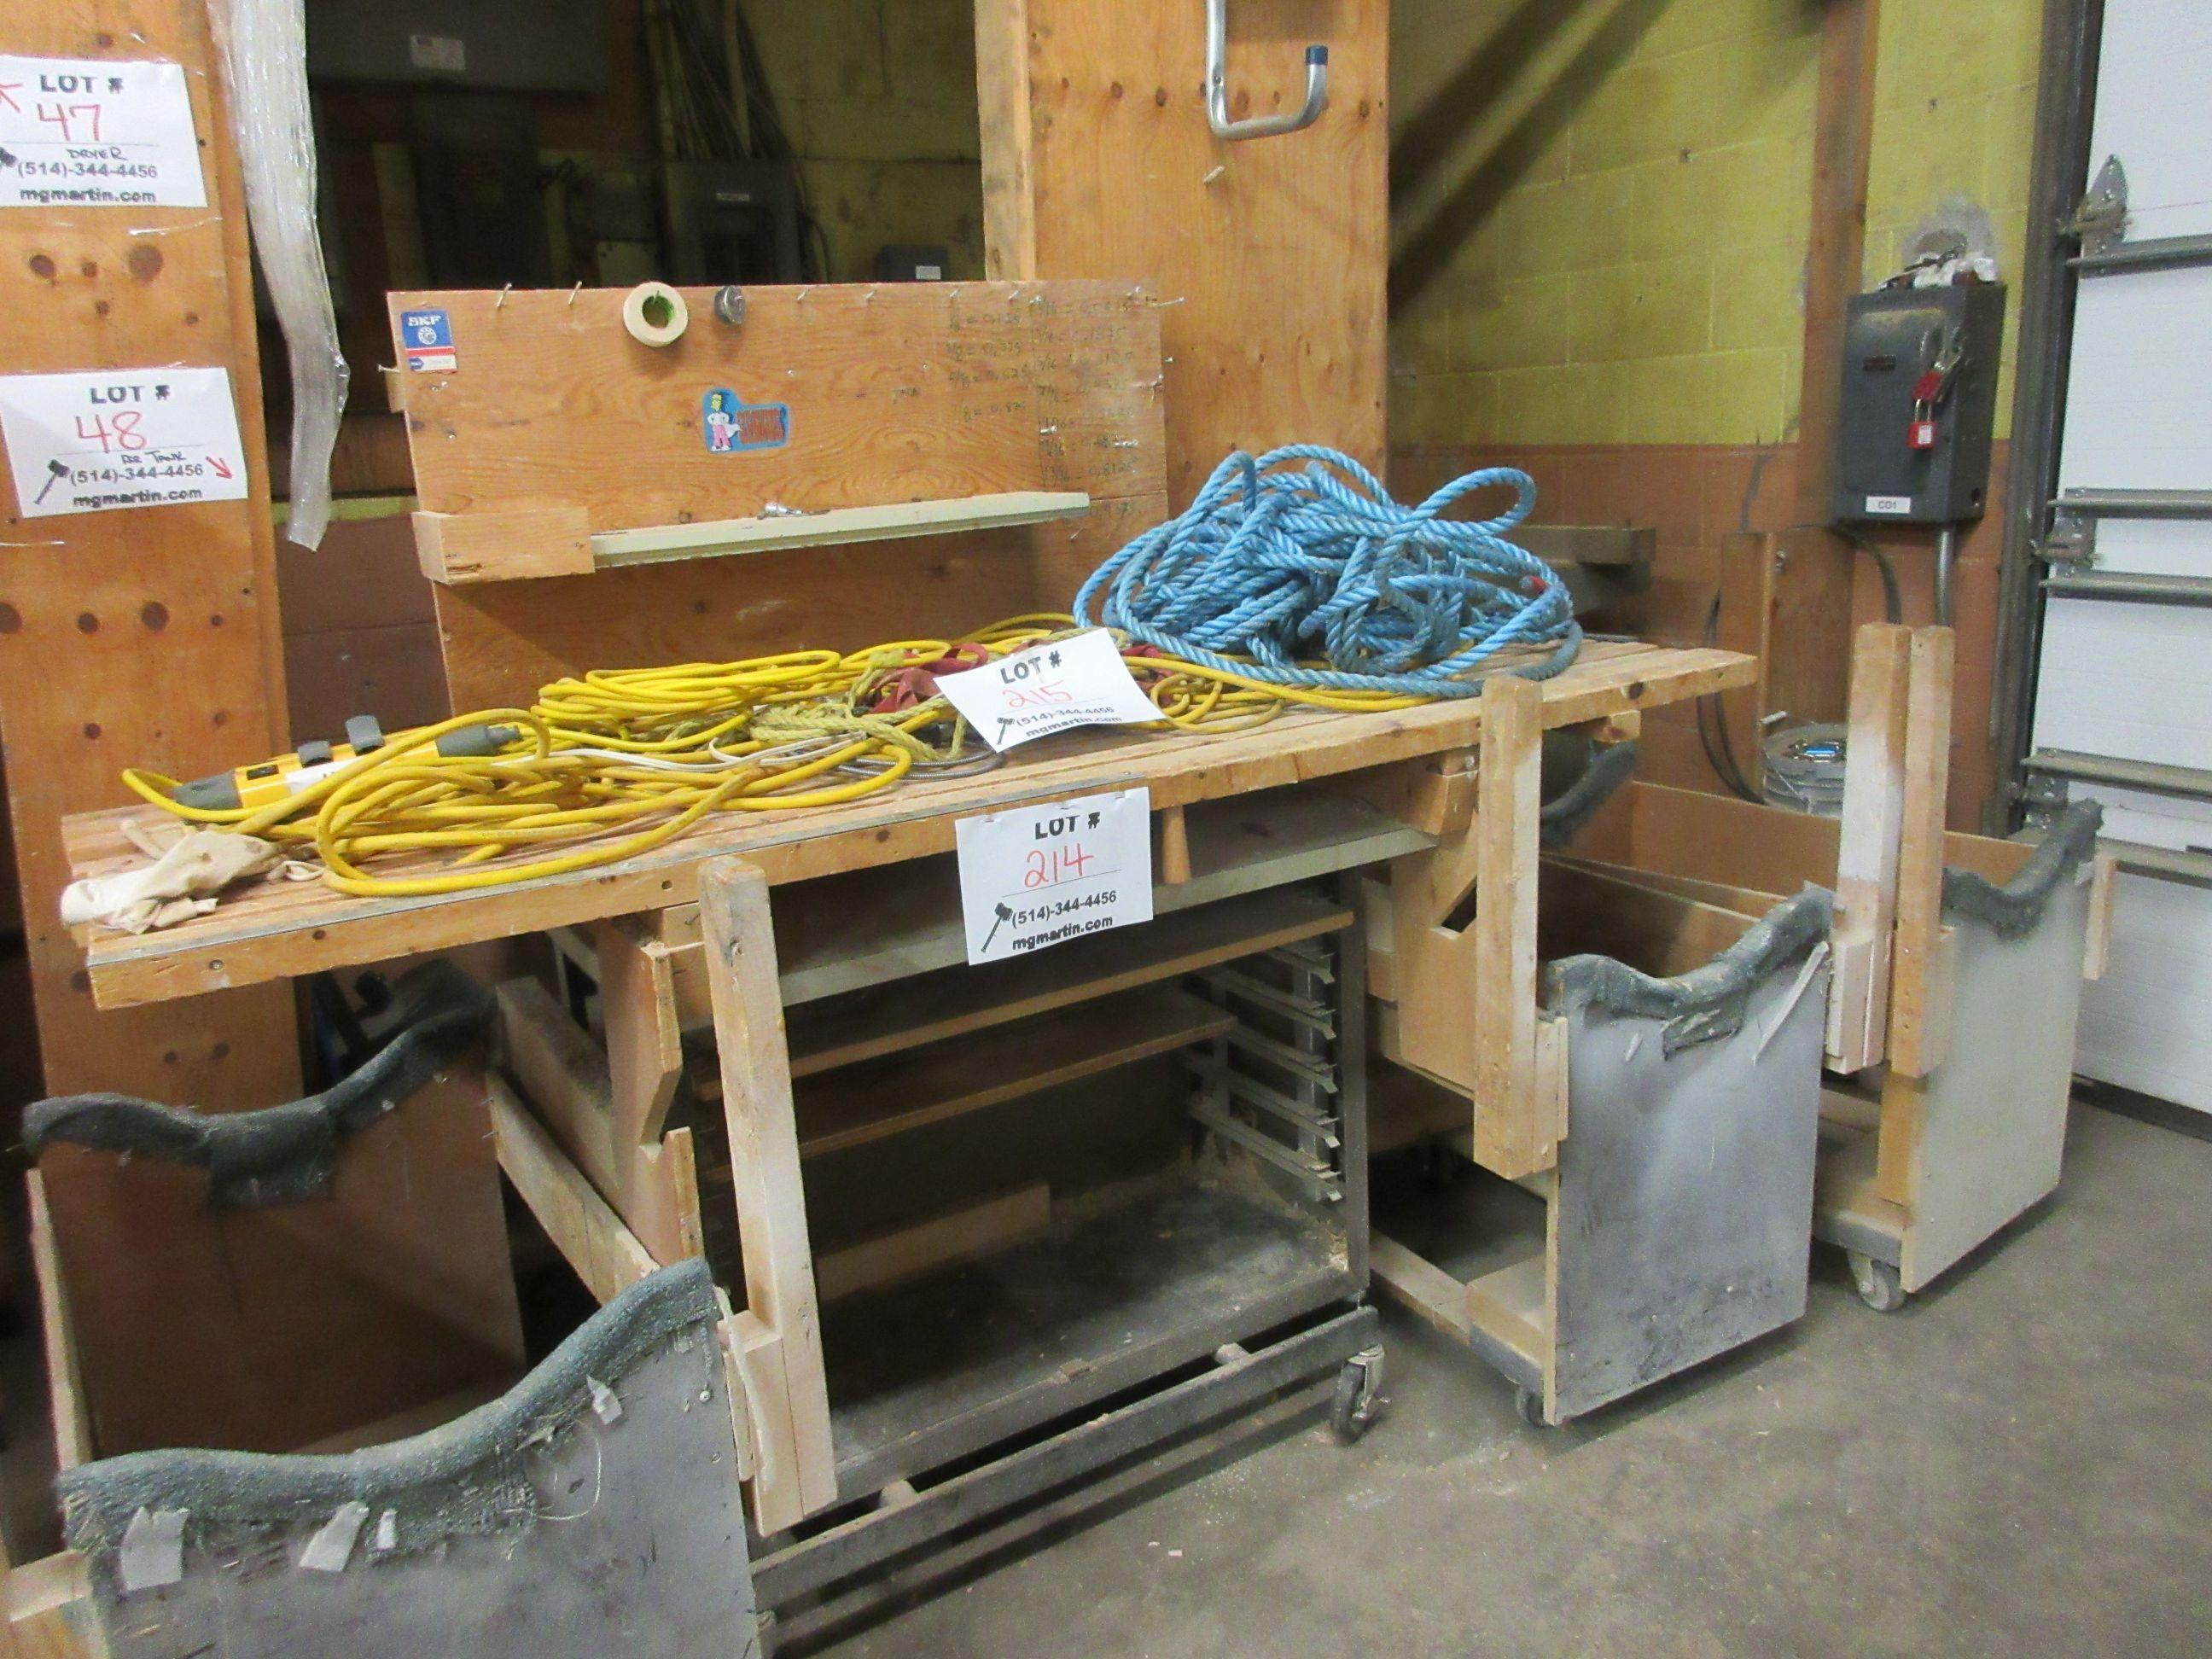 LOT assorted racking, wood desk, etc. - Image 4 of 4